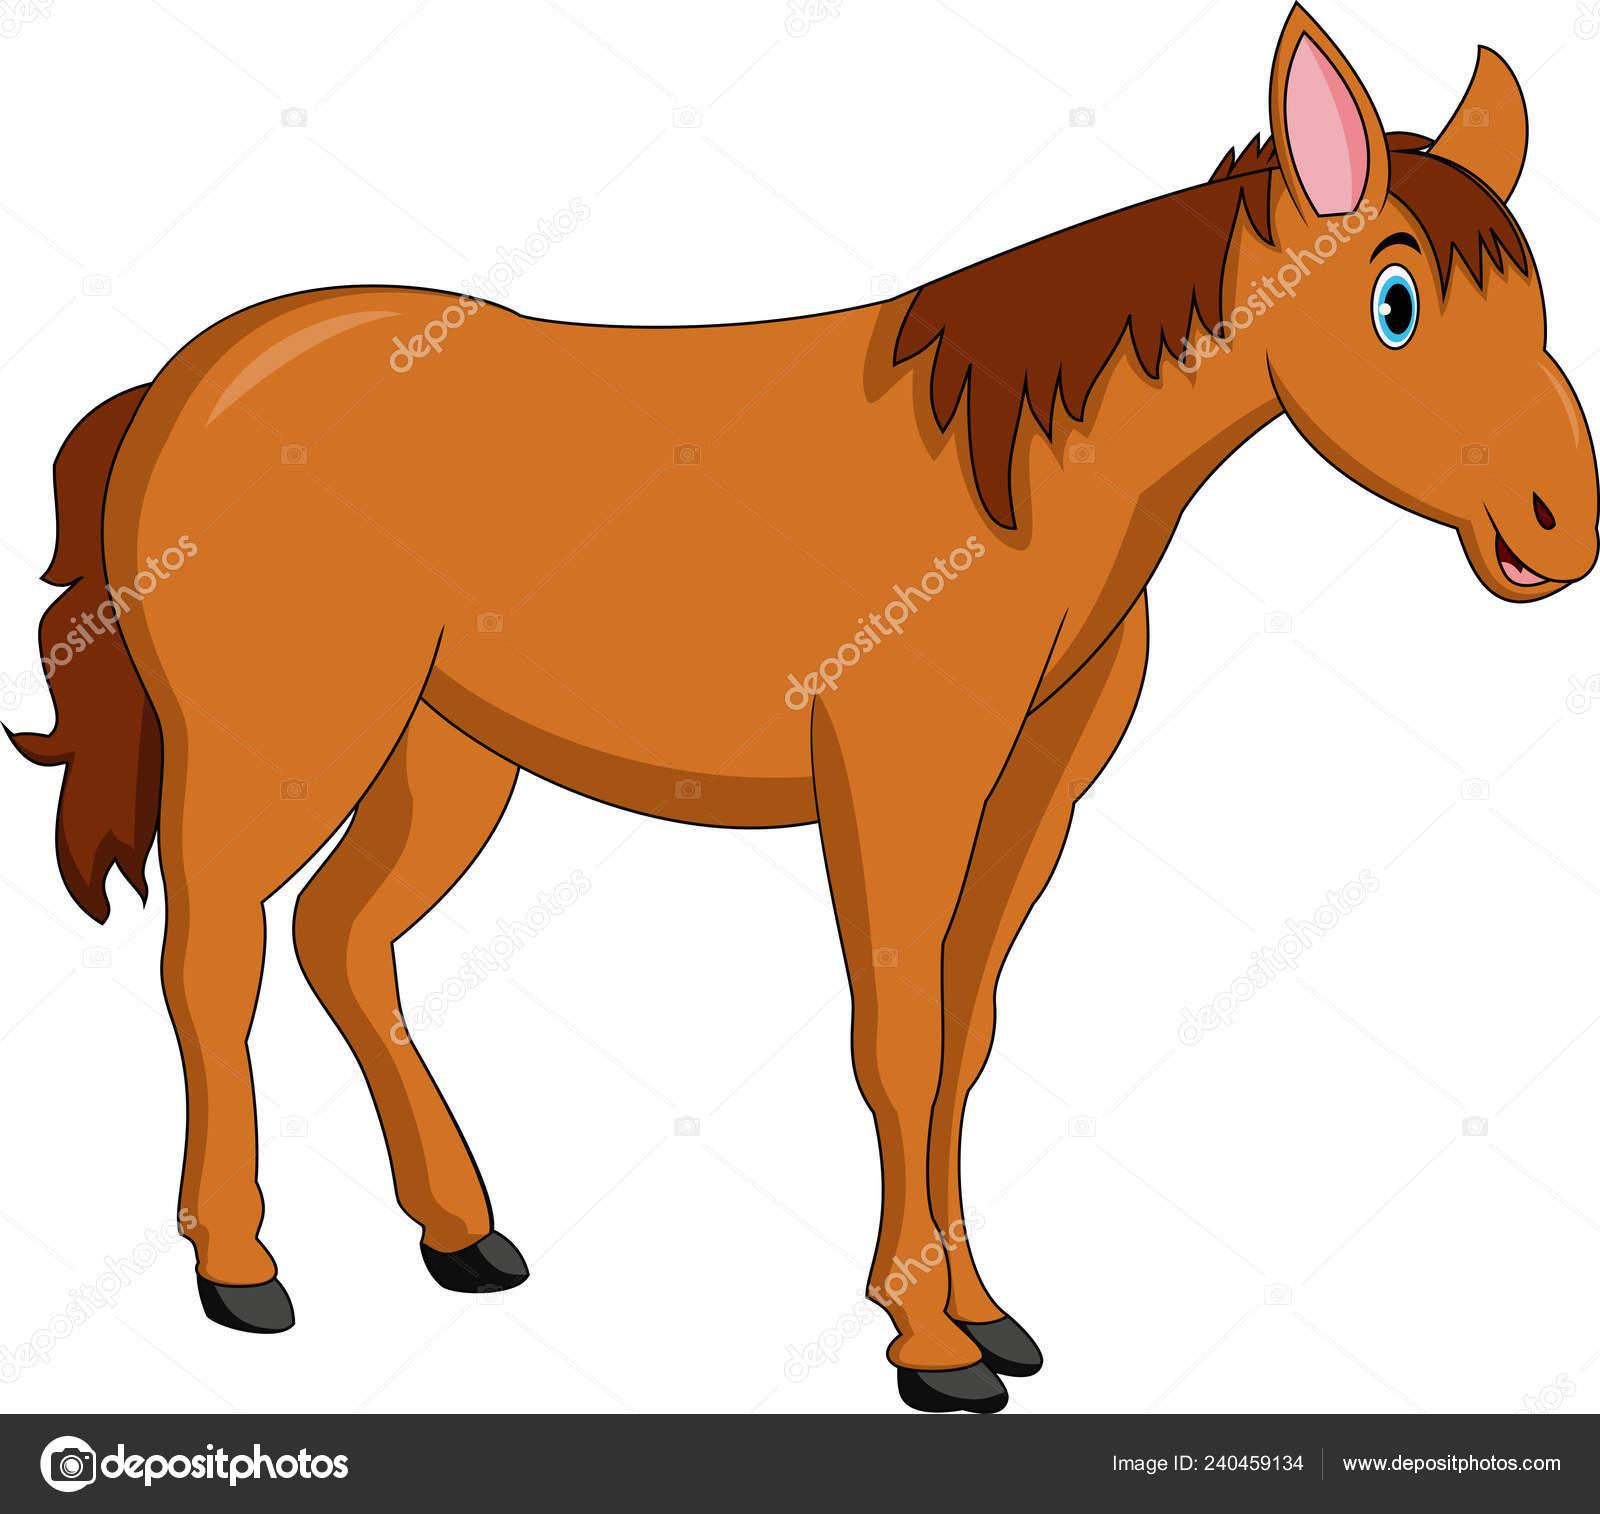 Vector Illustration Cute Horse Cartoon Stock Vector C Ciputra 240459134